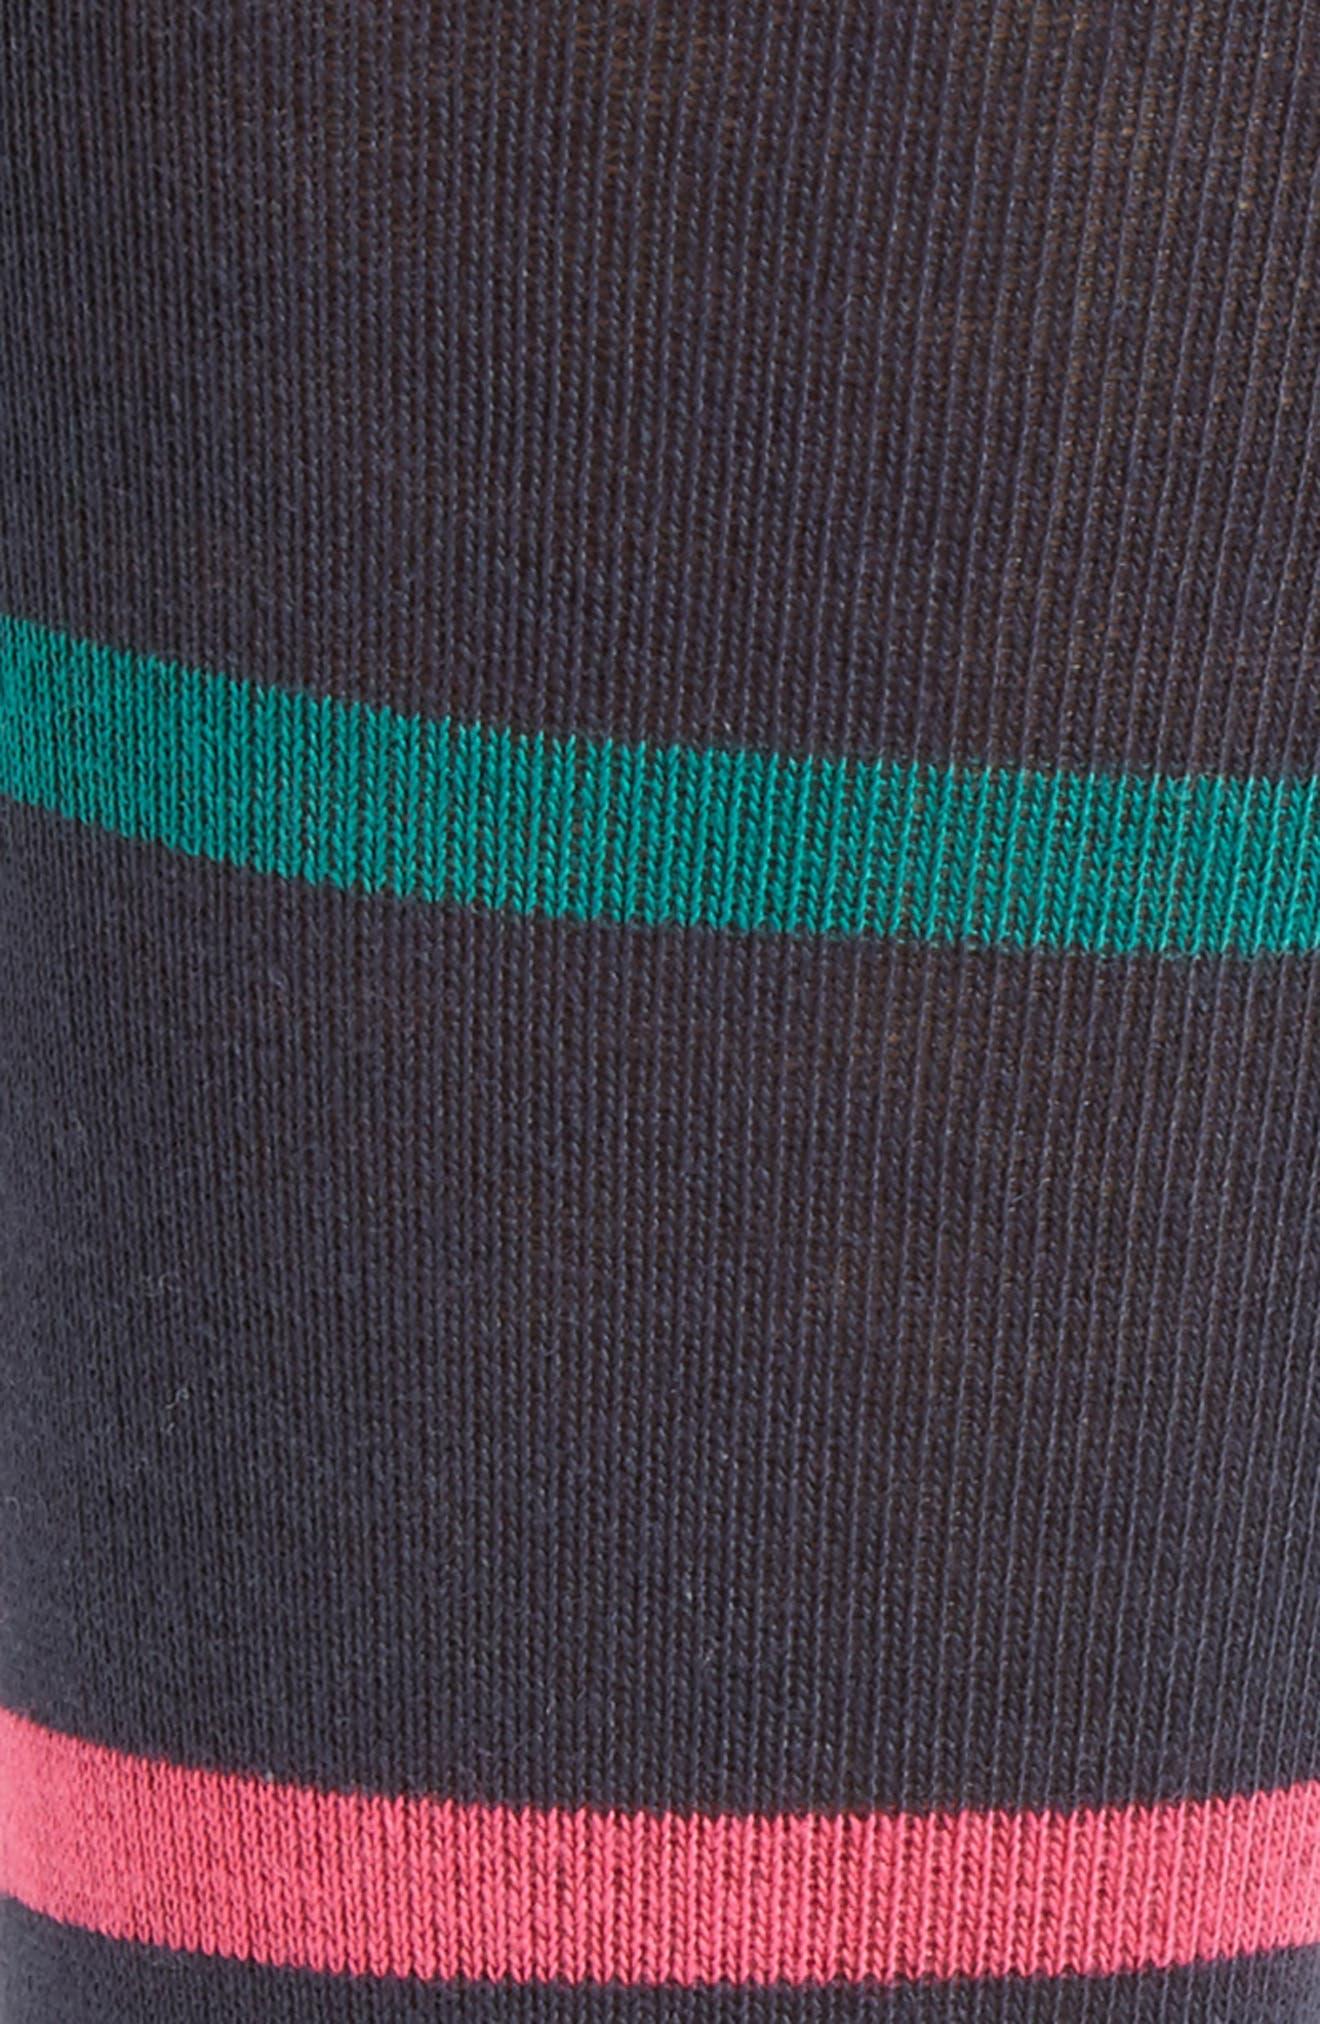 Stripe Crew Socks,                             Alternate thumbnail 2, color,                             Navy